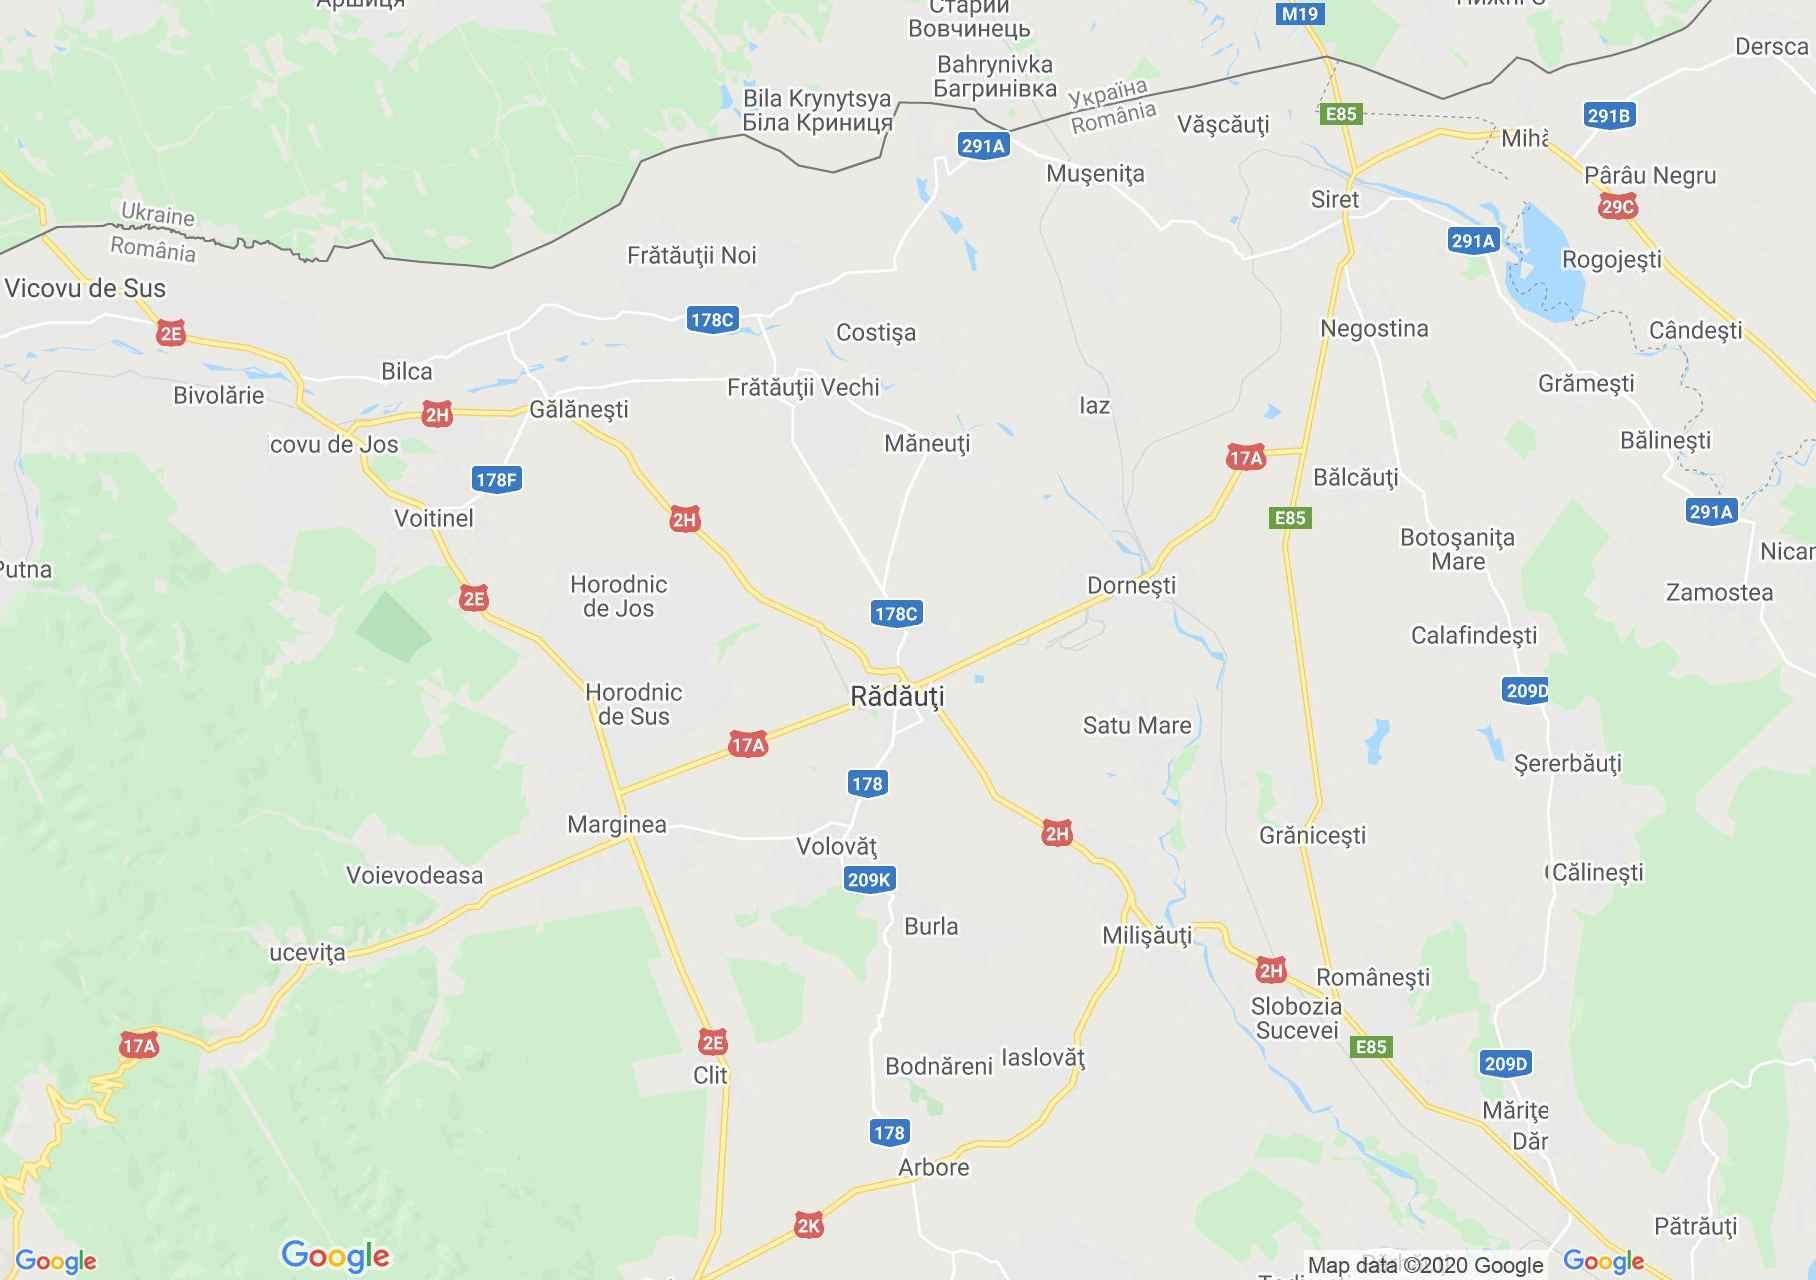 Rădăuţi környéke interaktív turista térképe.